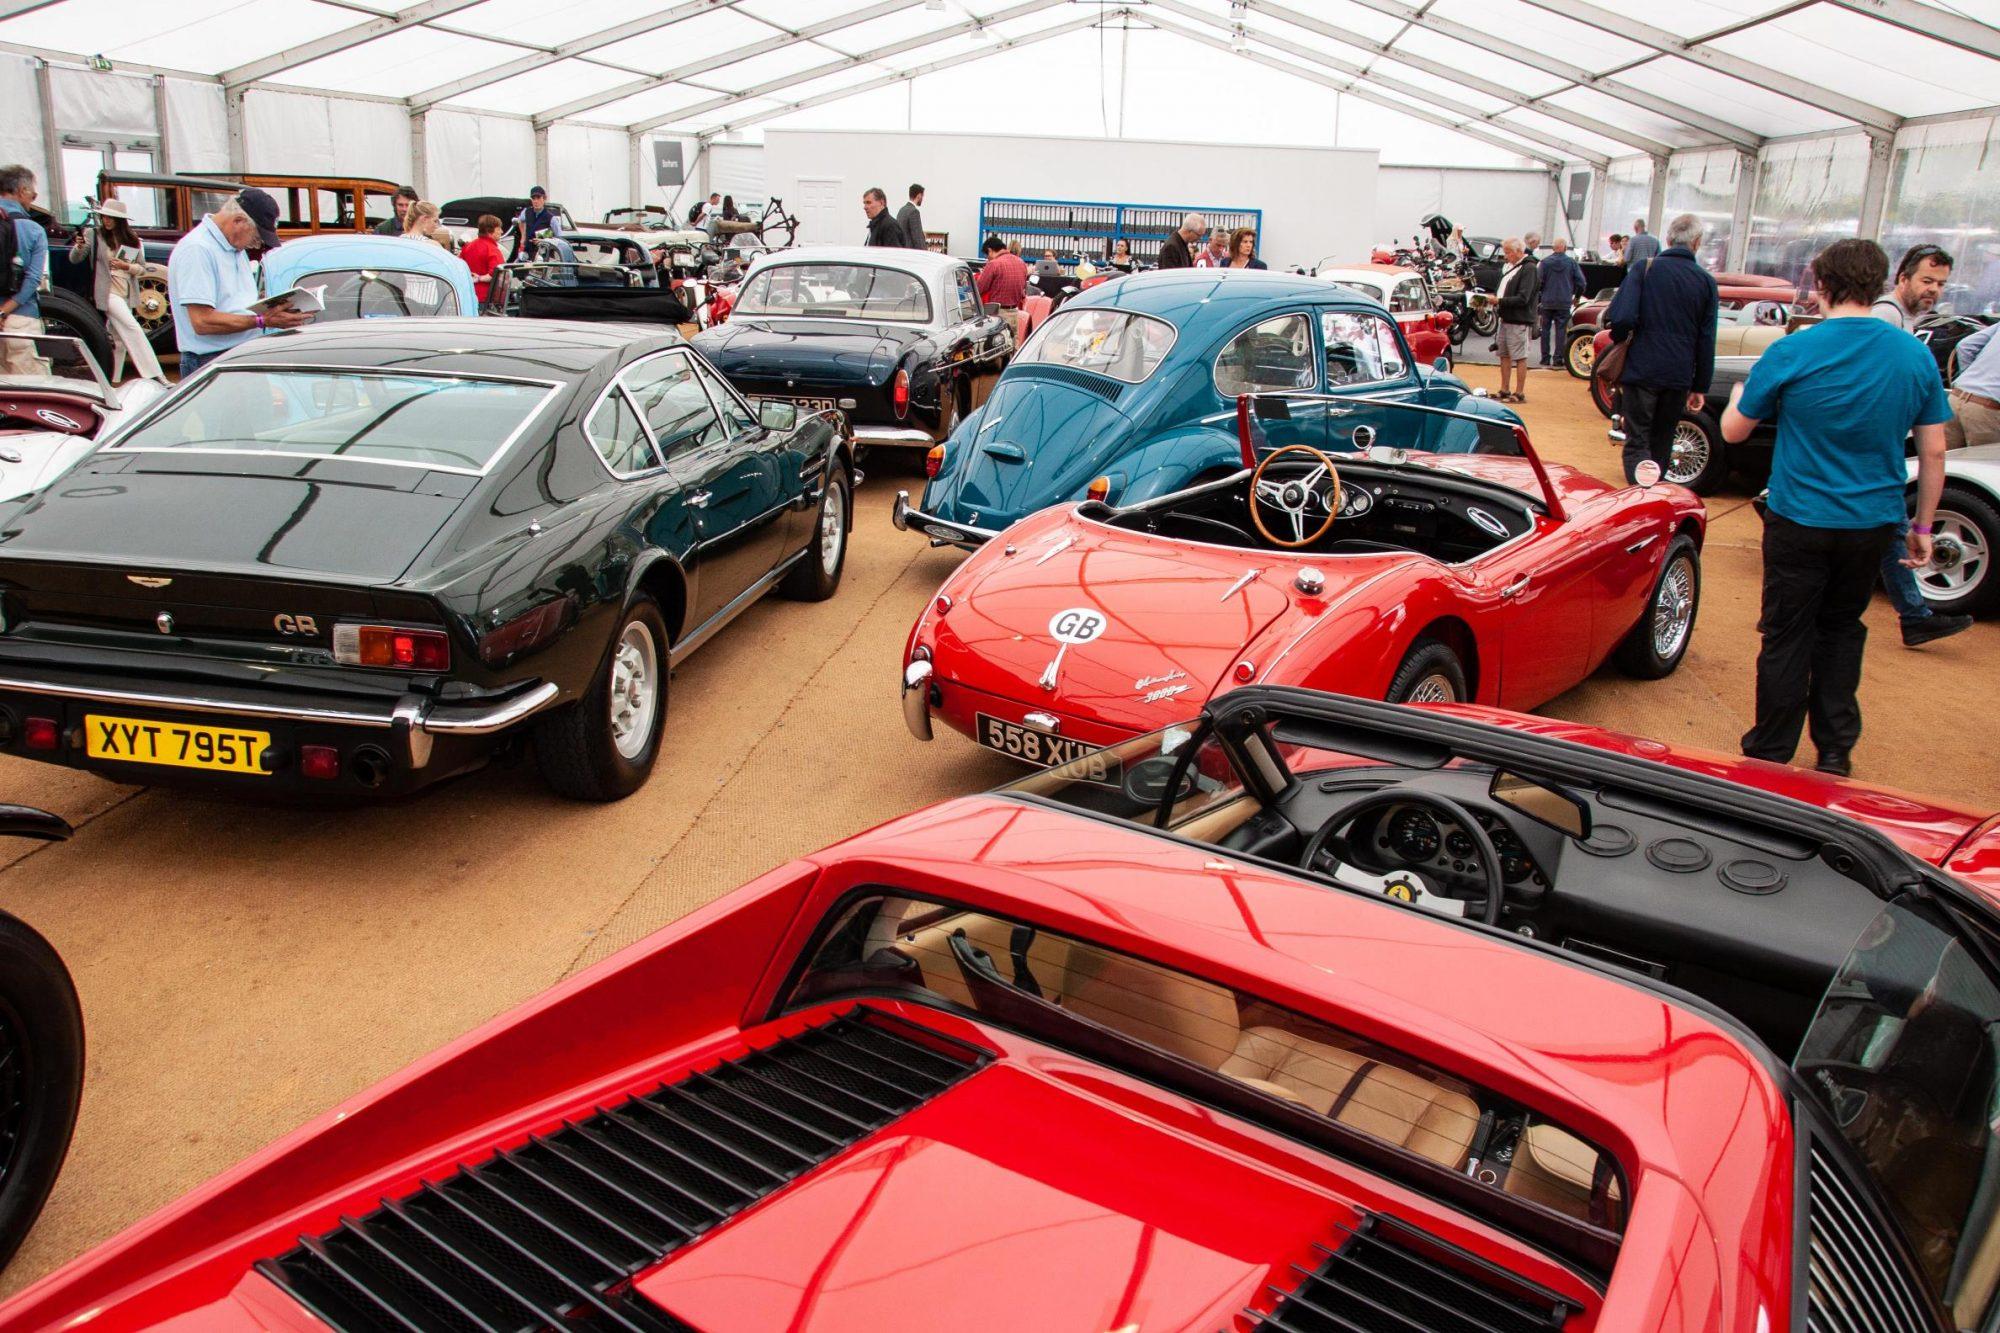 auction, classic car auction, classic car buying, classic car, retro car, motoring, automotive, carandclassic, carandclassic.co.uk,